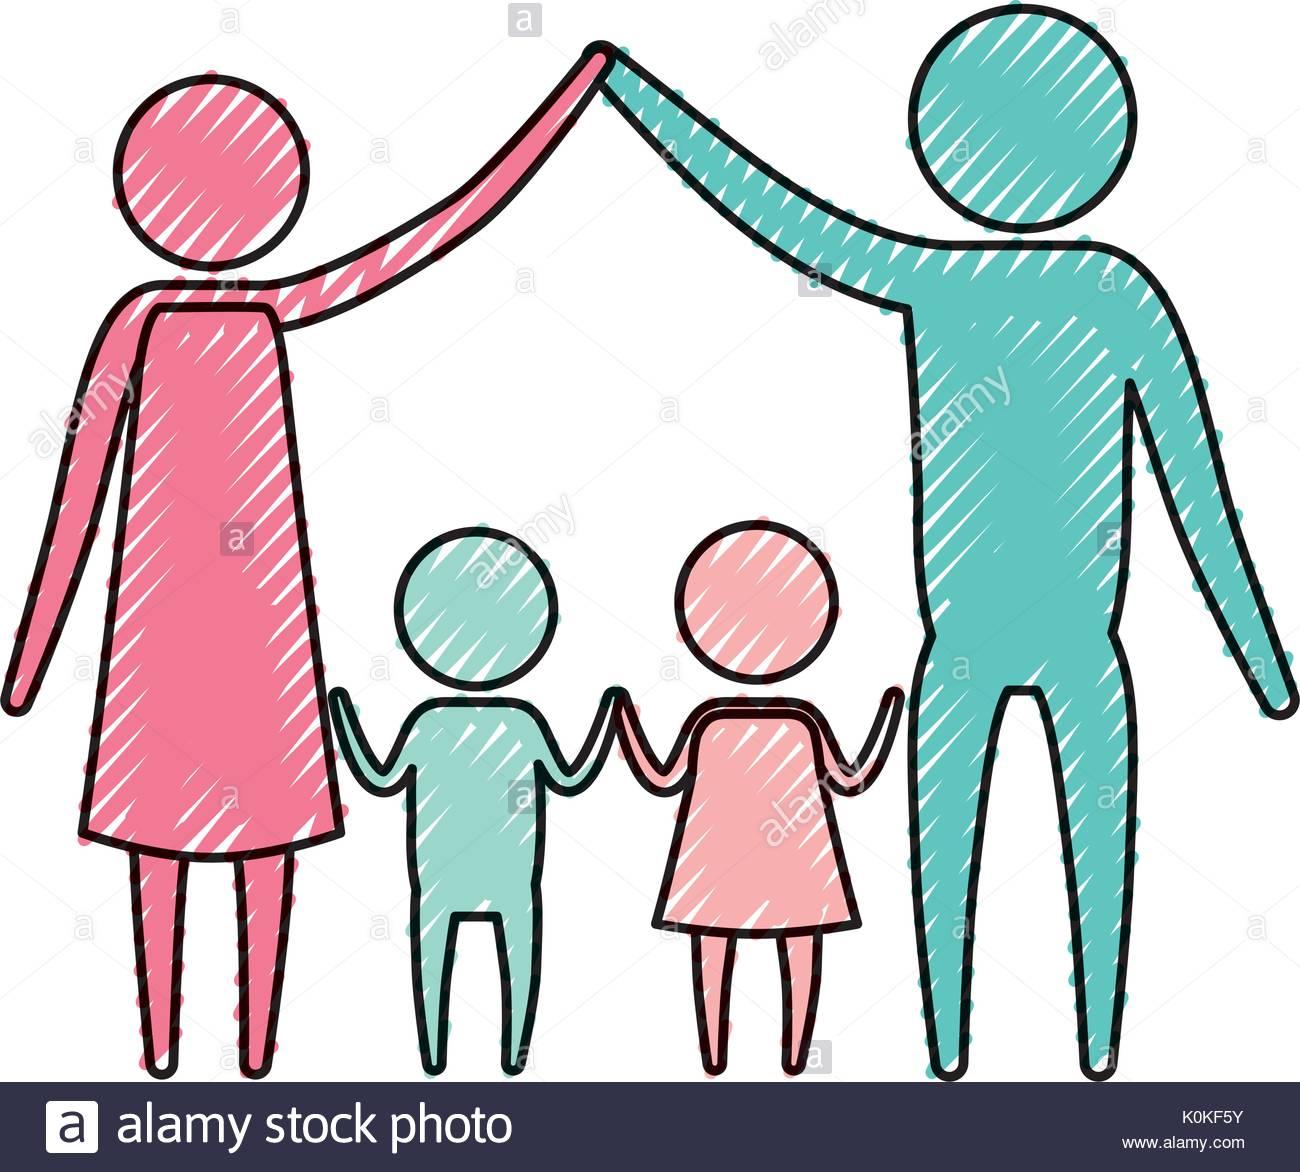 1300x1172 Color Crayon Silhouette Pictogram Couple Parents Holding Hands Up